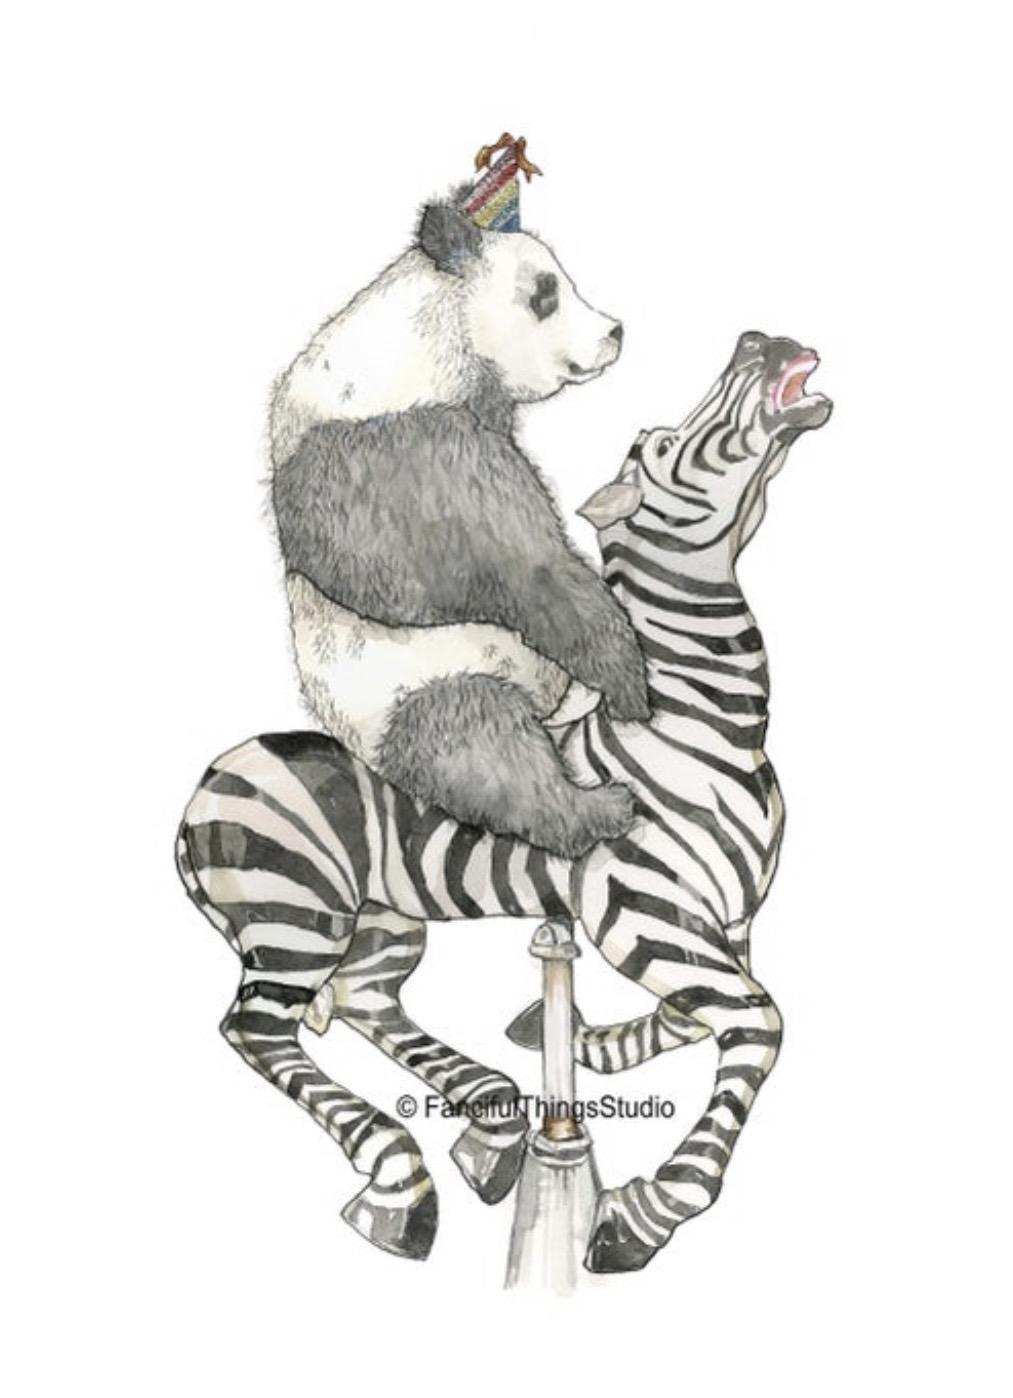 Panda on a Carousel Zebra